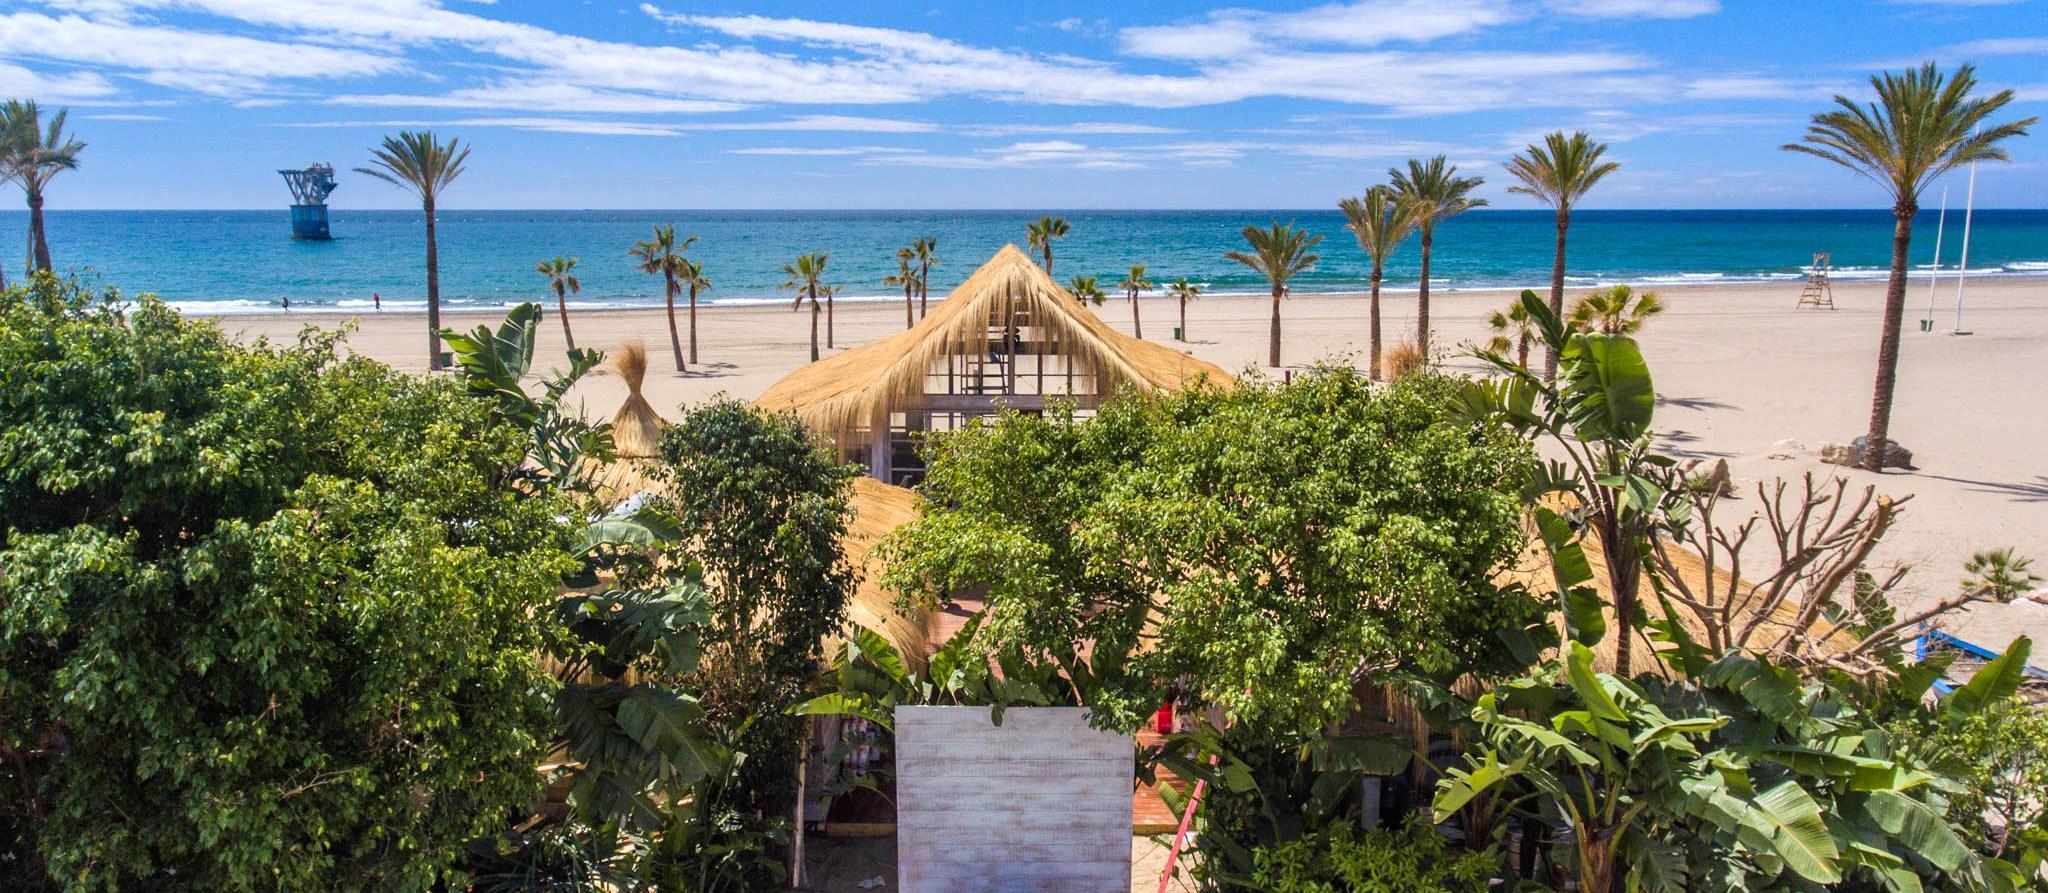 Playa Padre Marbella